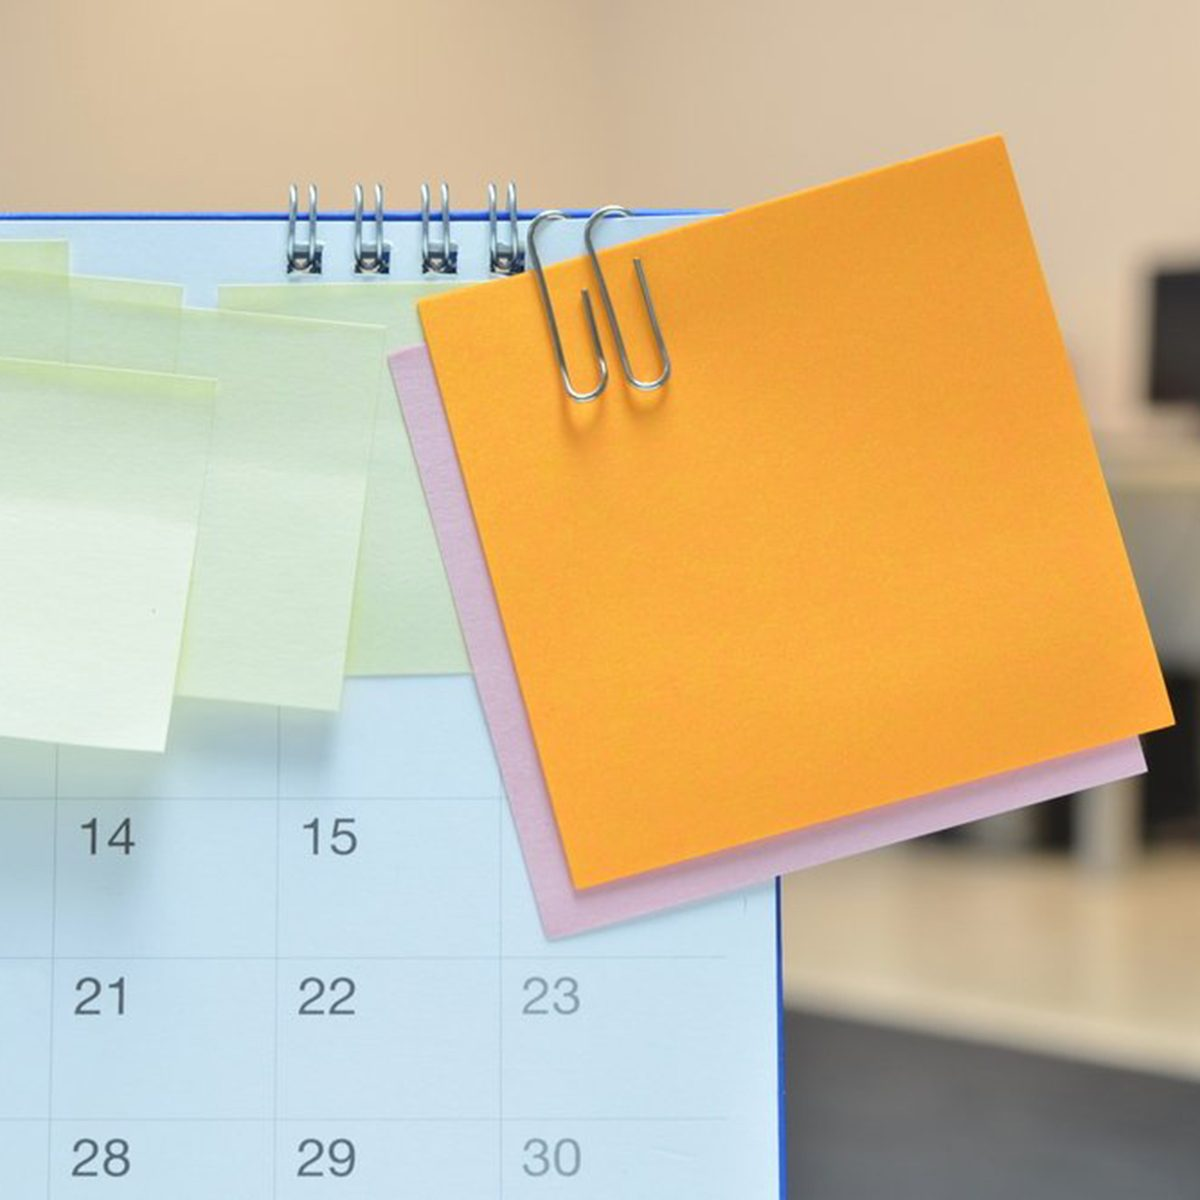 Post-it notes on calendar